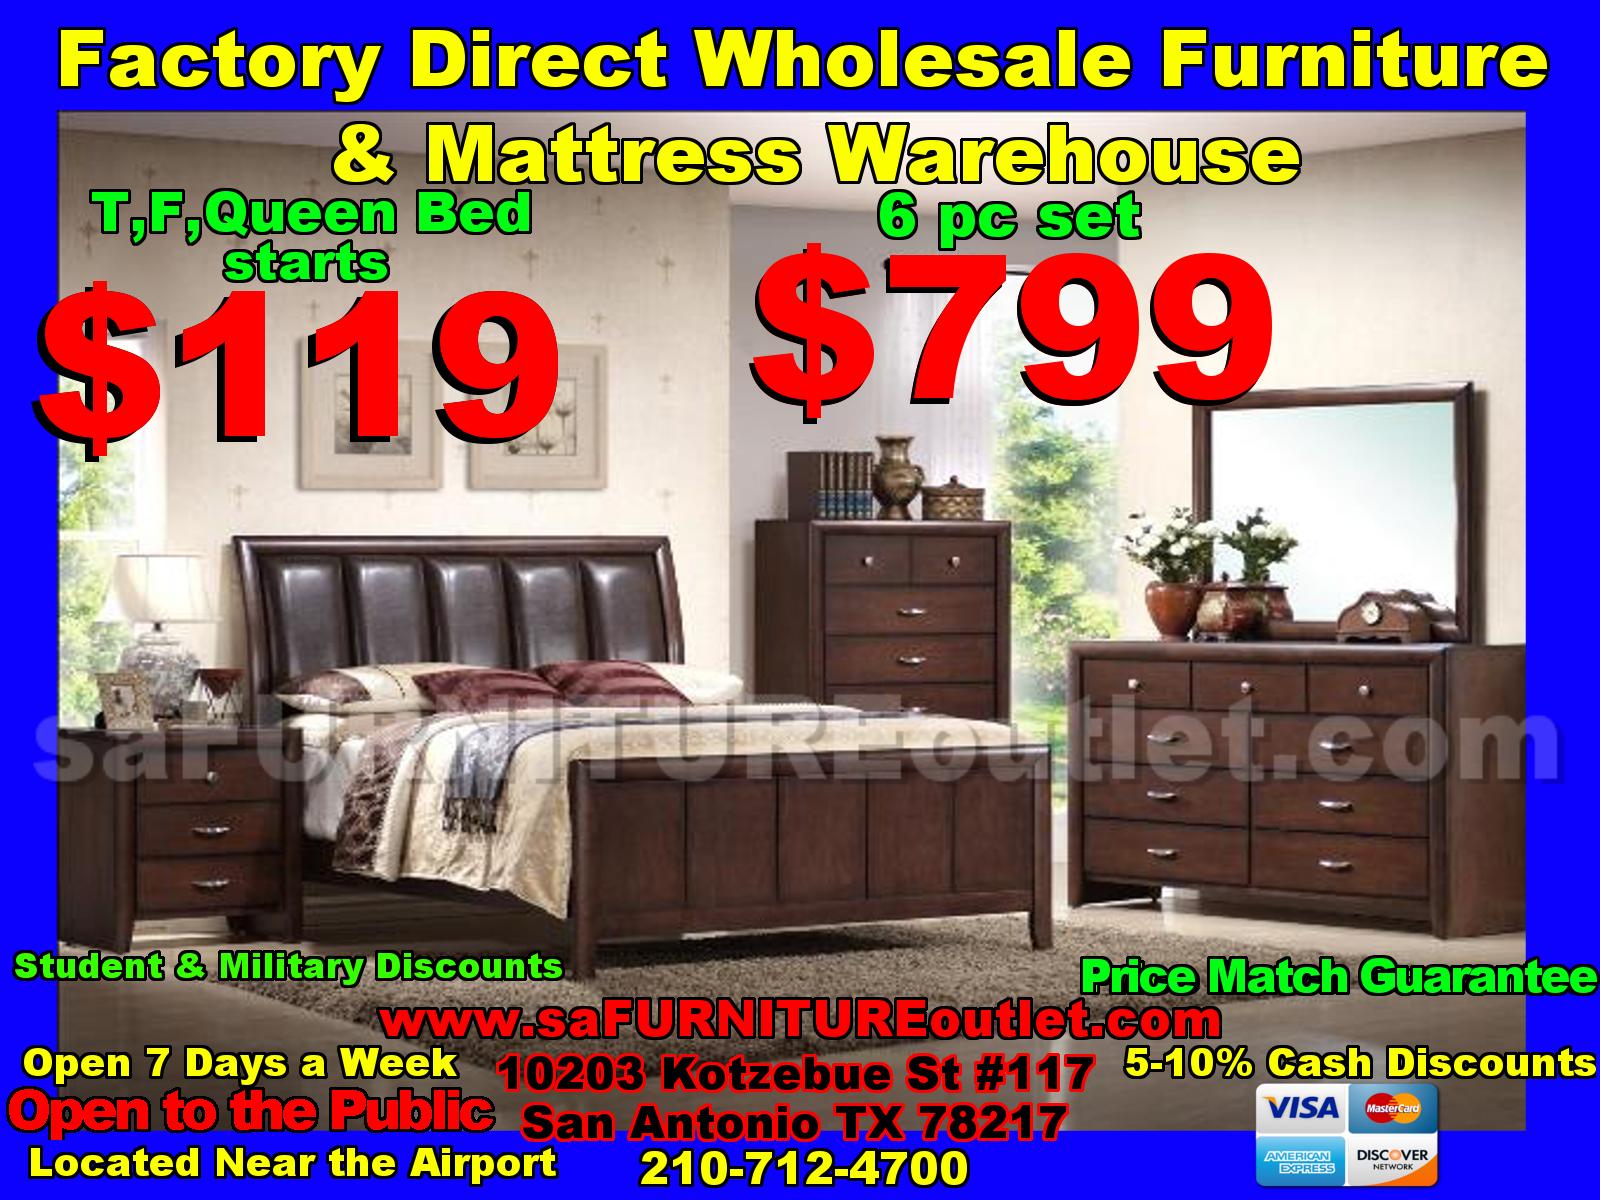 Bedroom Sets : SA Furniture, San Antonio Furniture of Texas